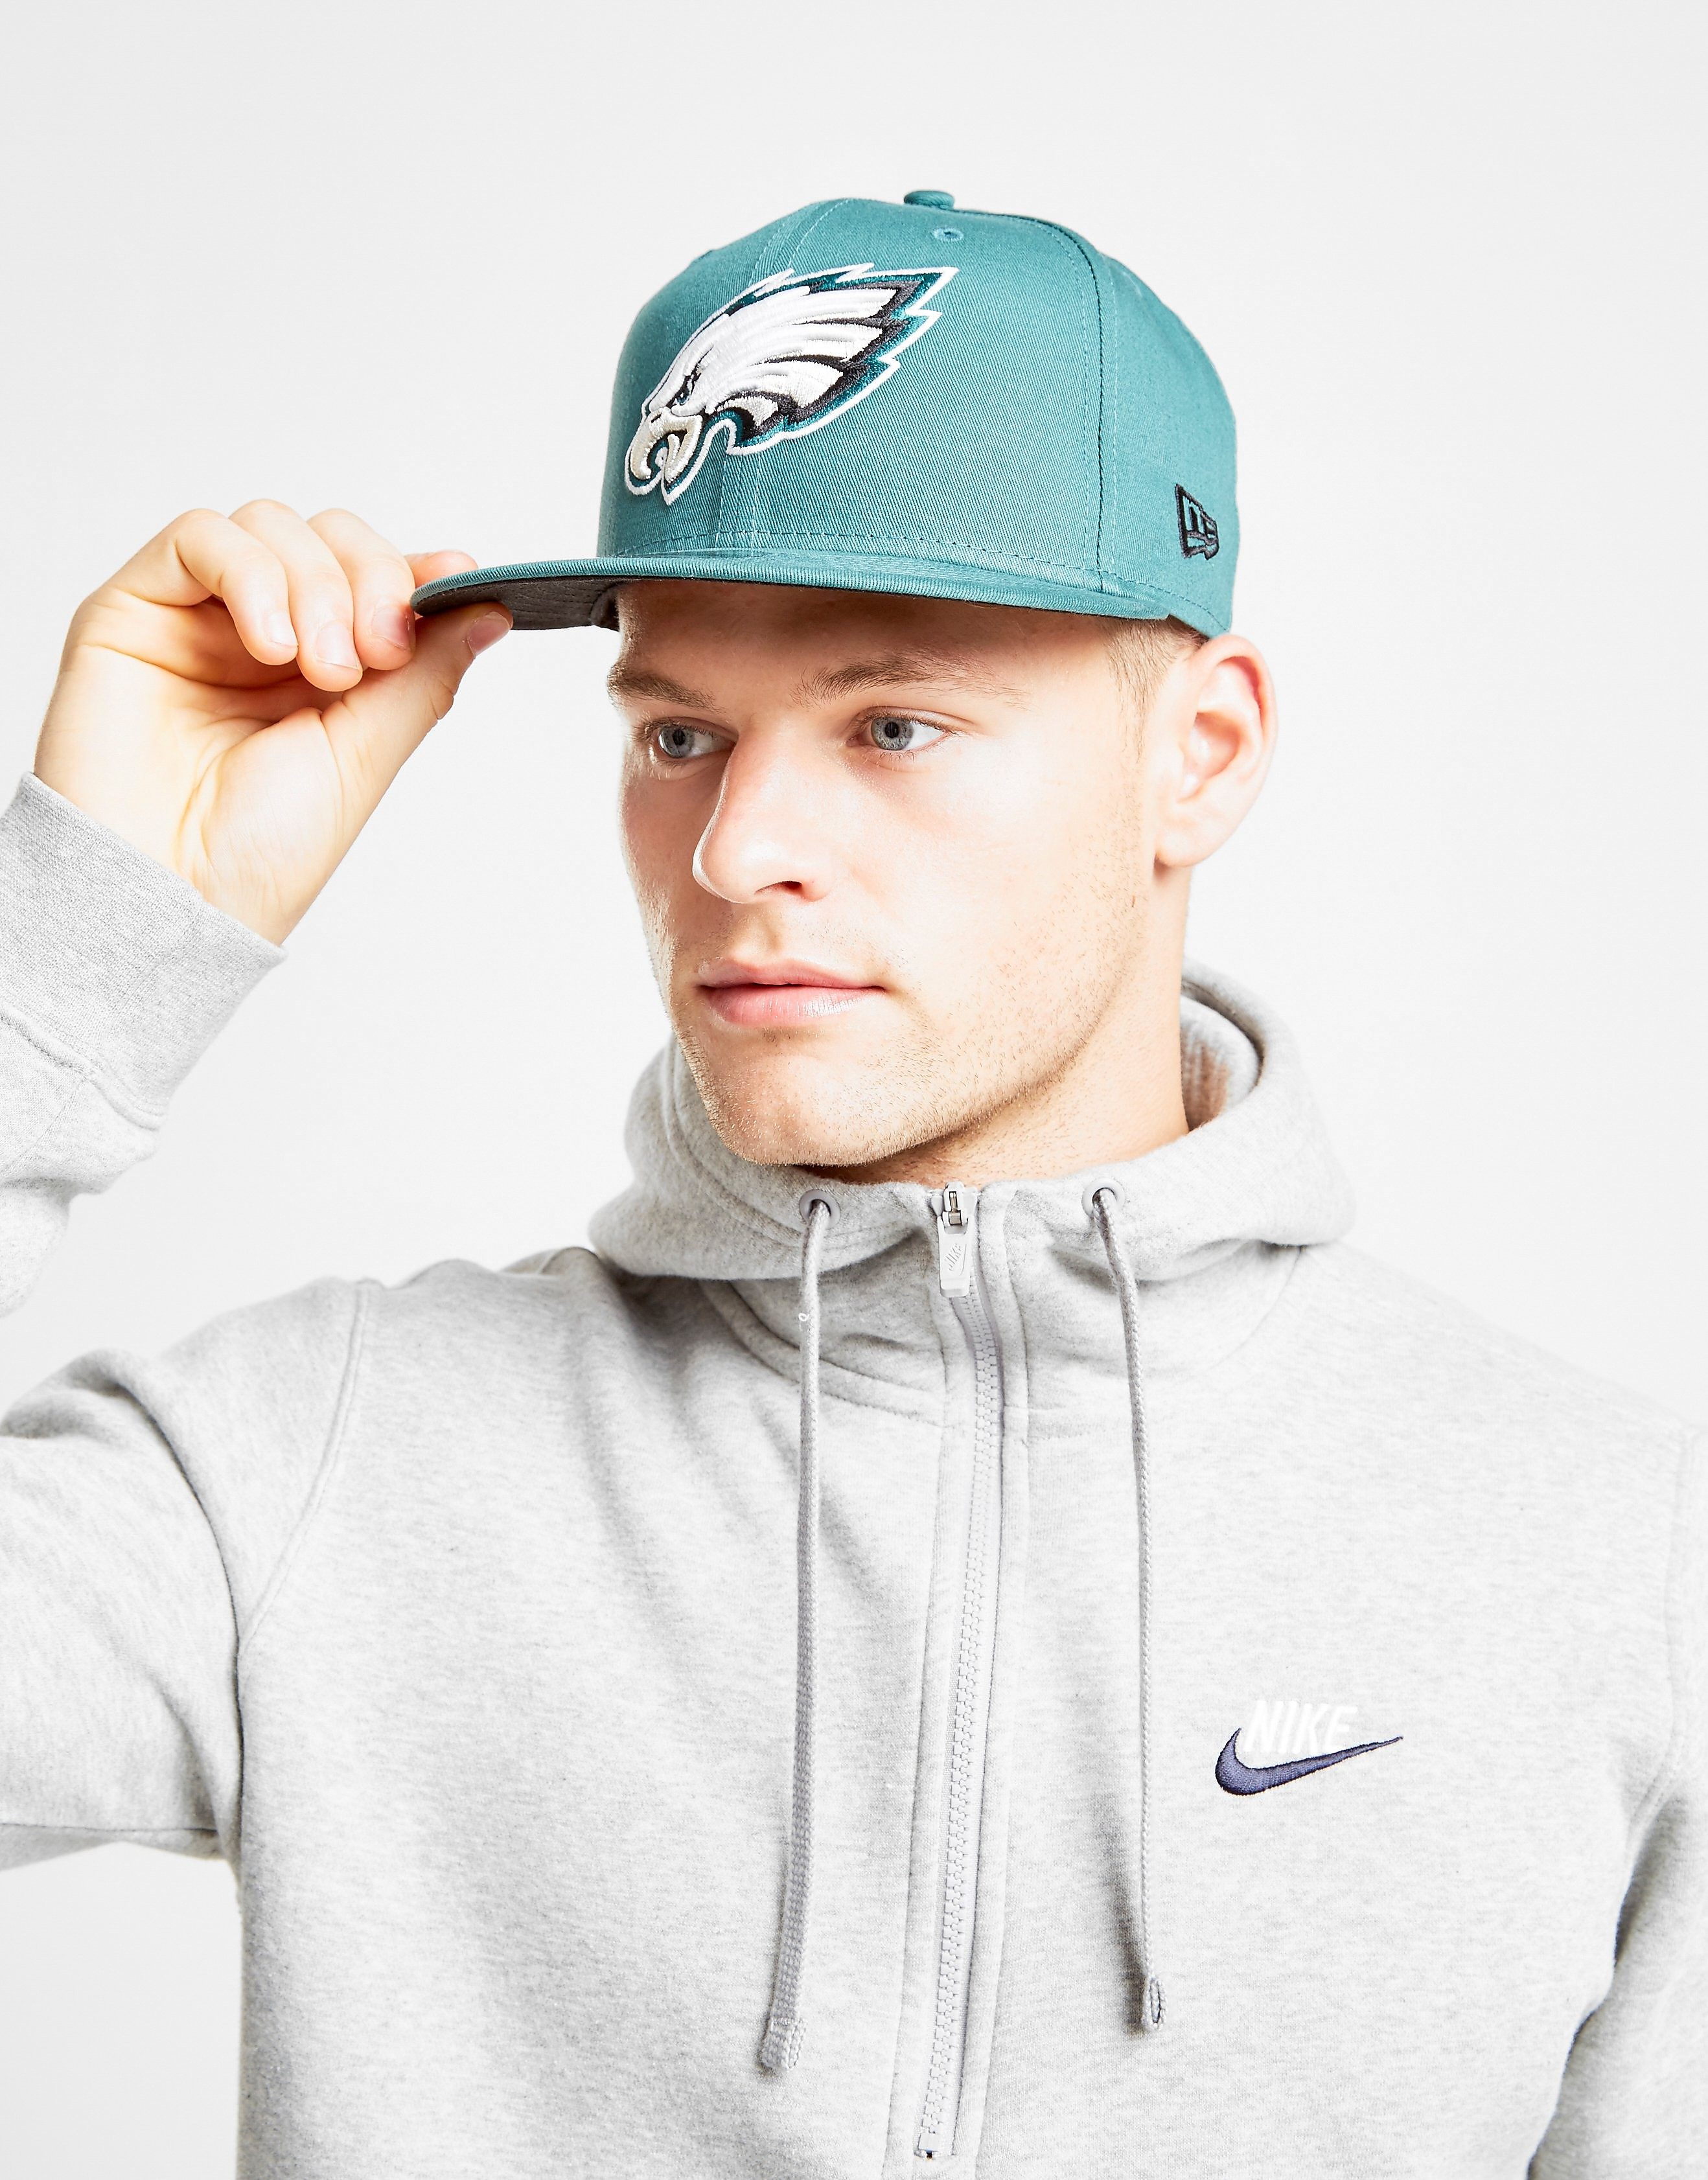 New Era NFL Philadelphia Eagles 9FIFTY Cap - Groen - Heren